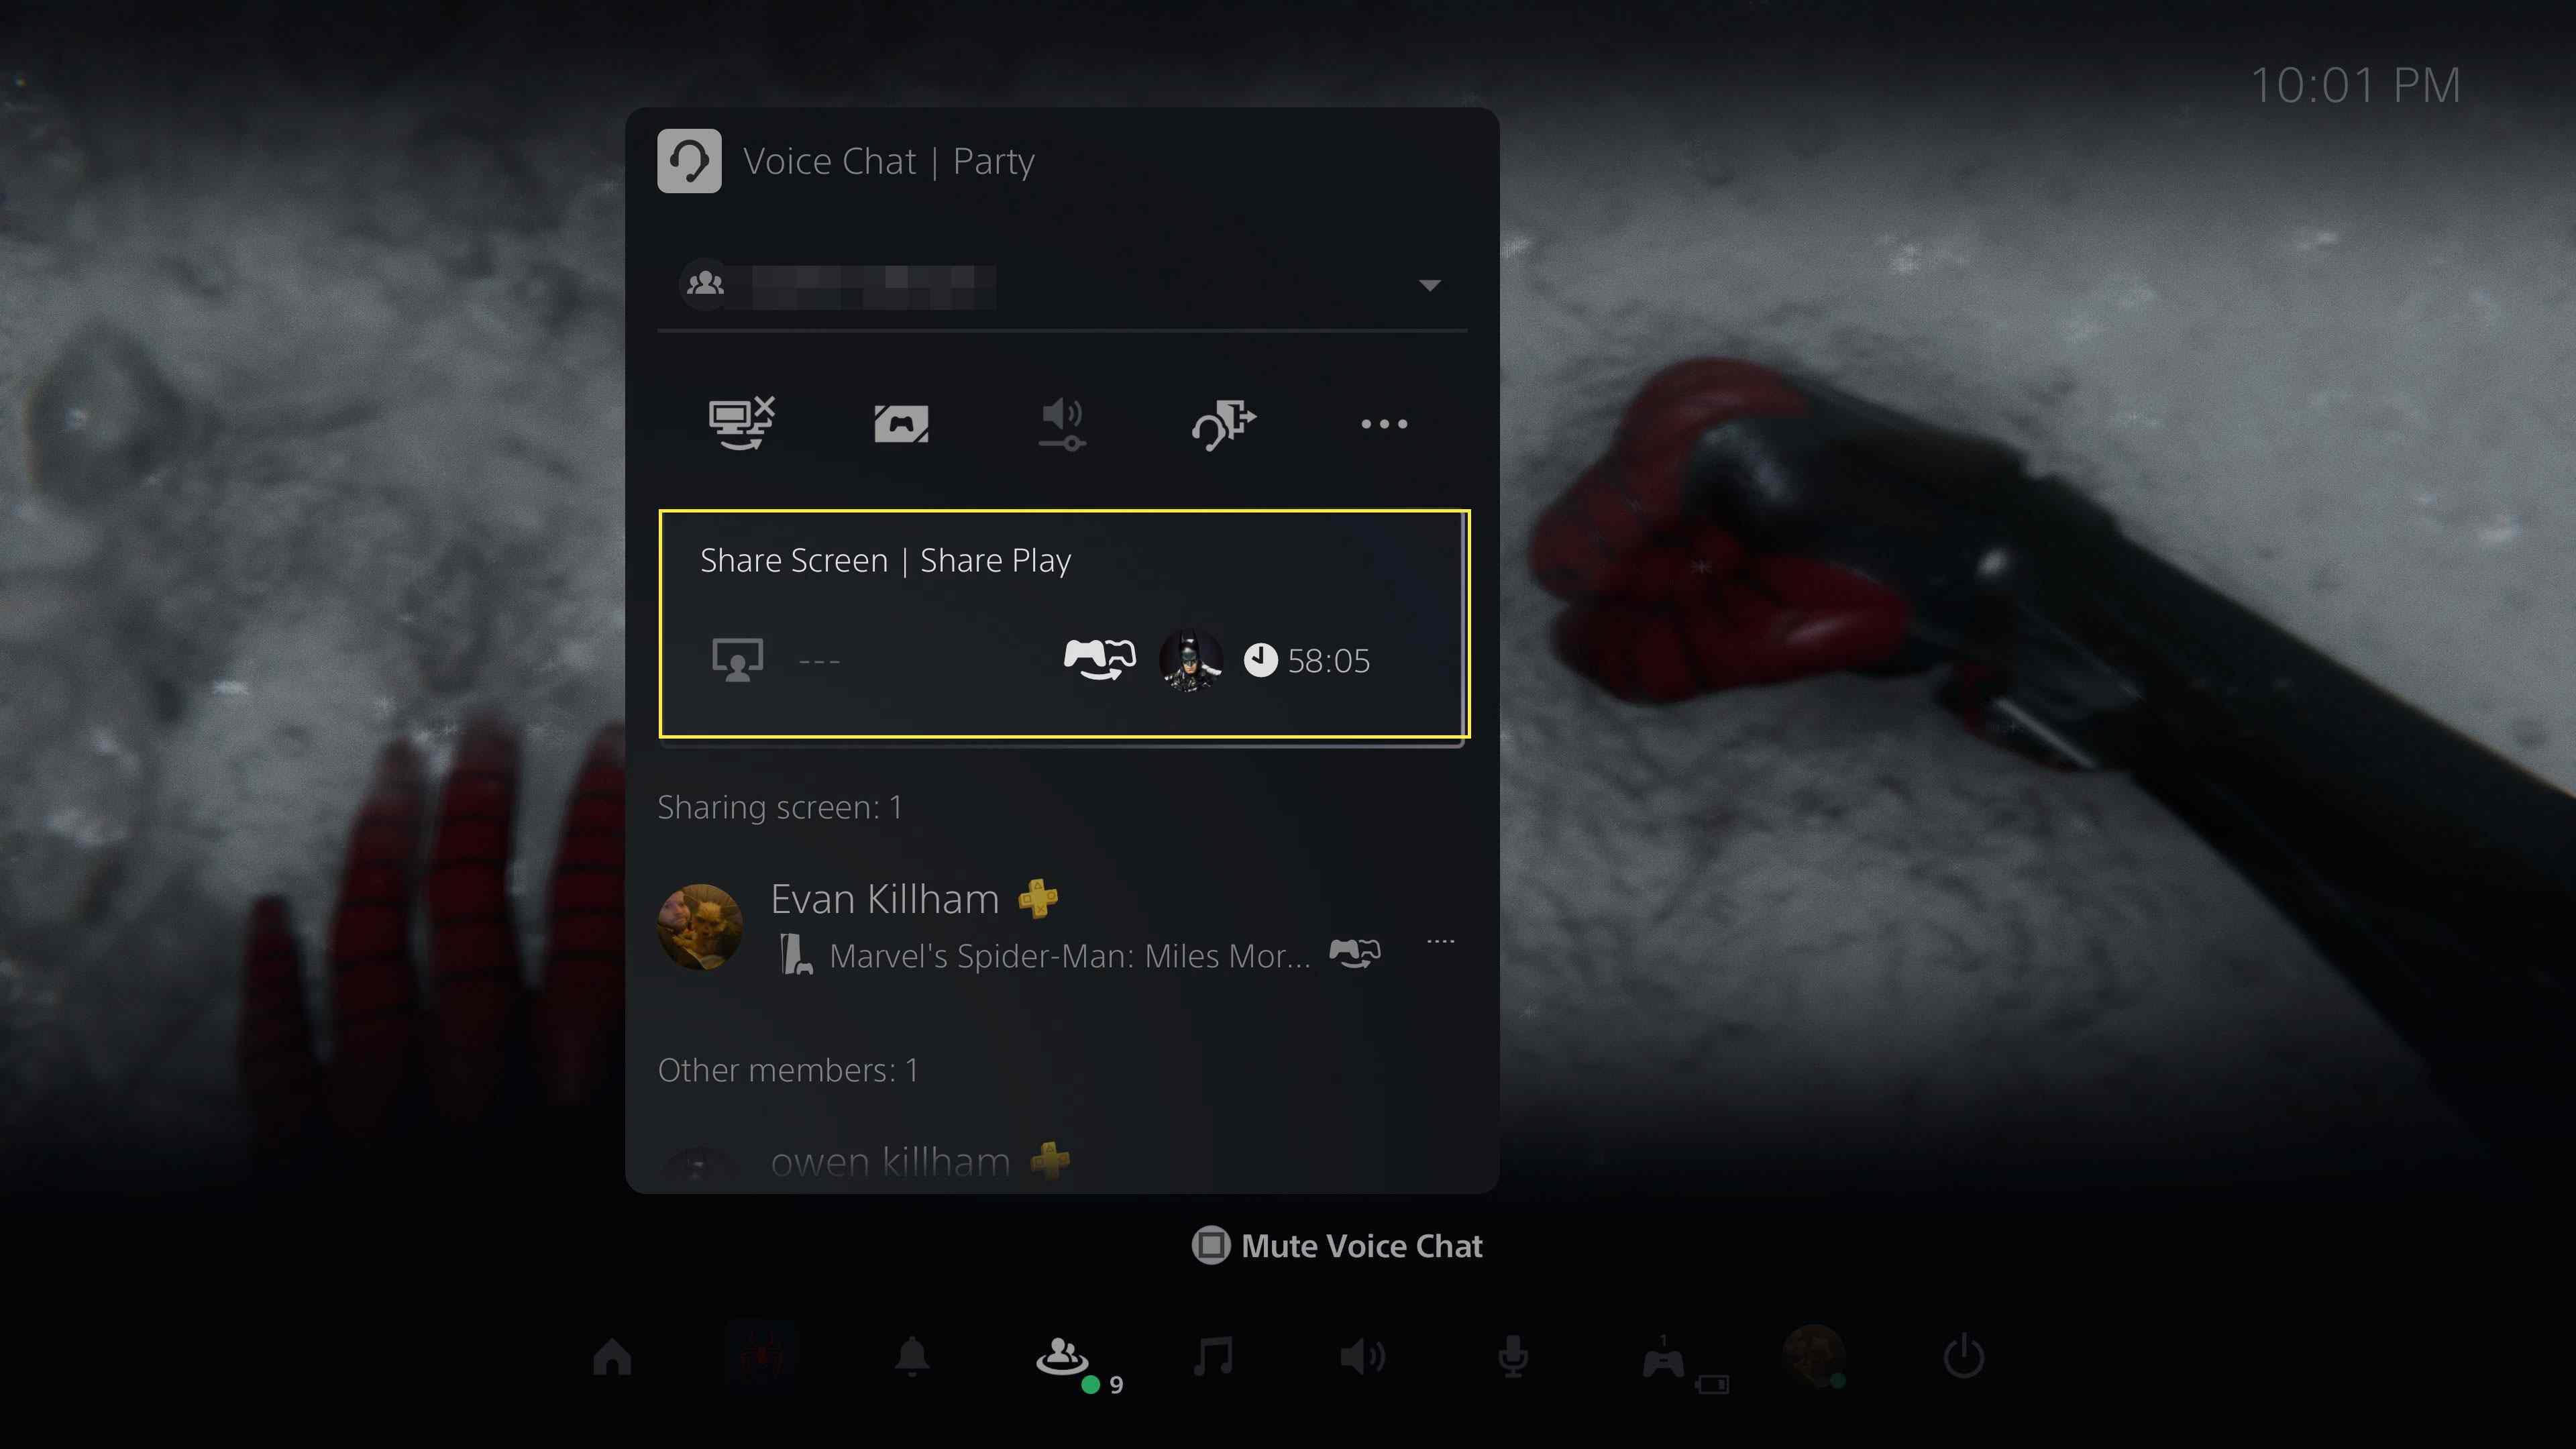 The Share Screen | Share Play menu item